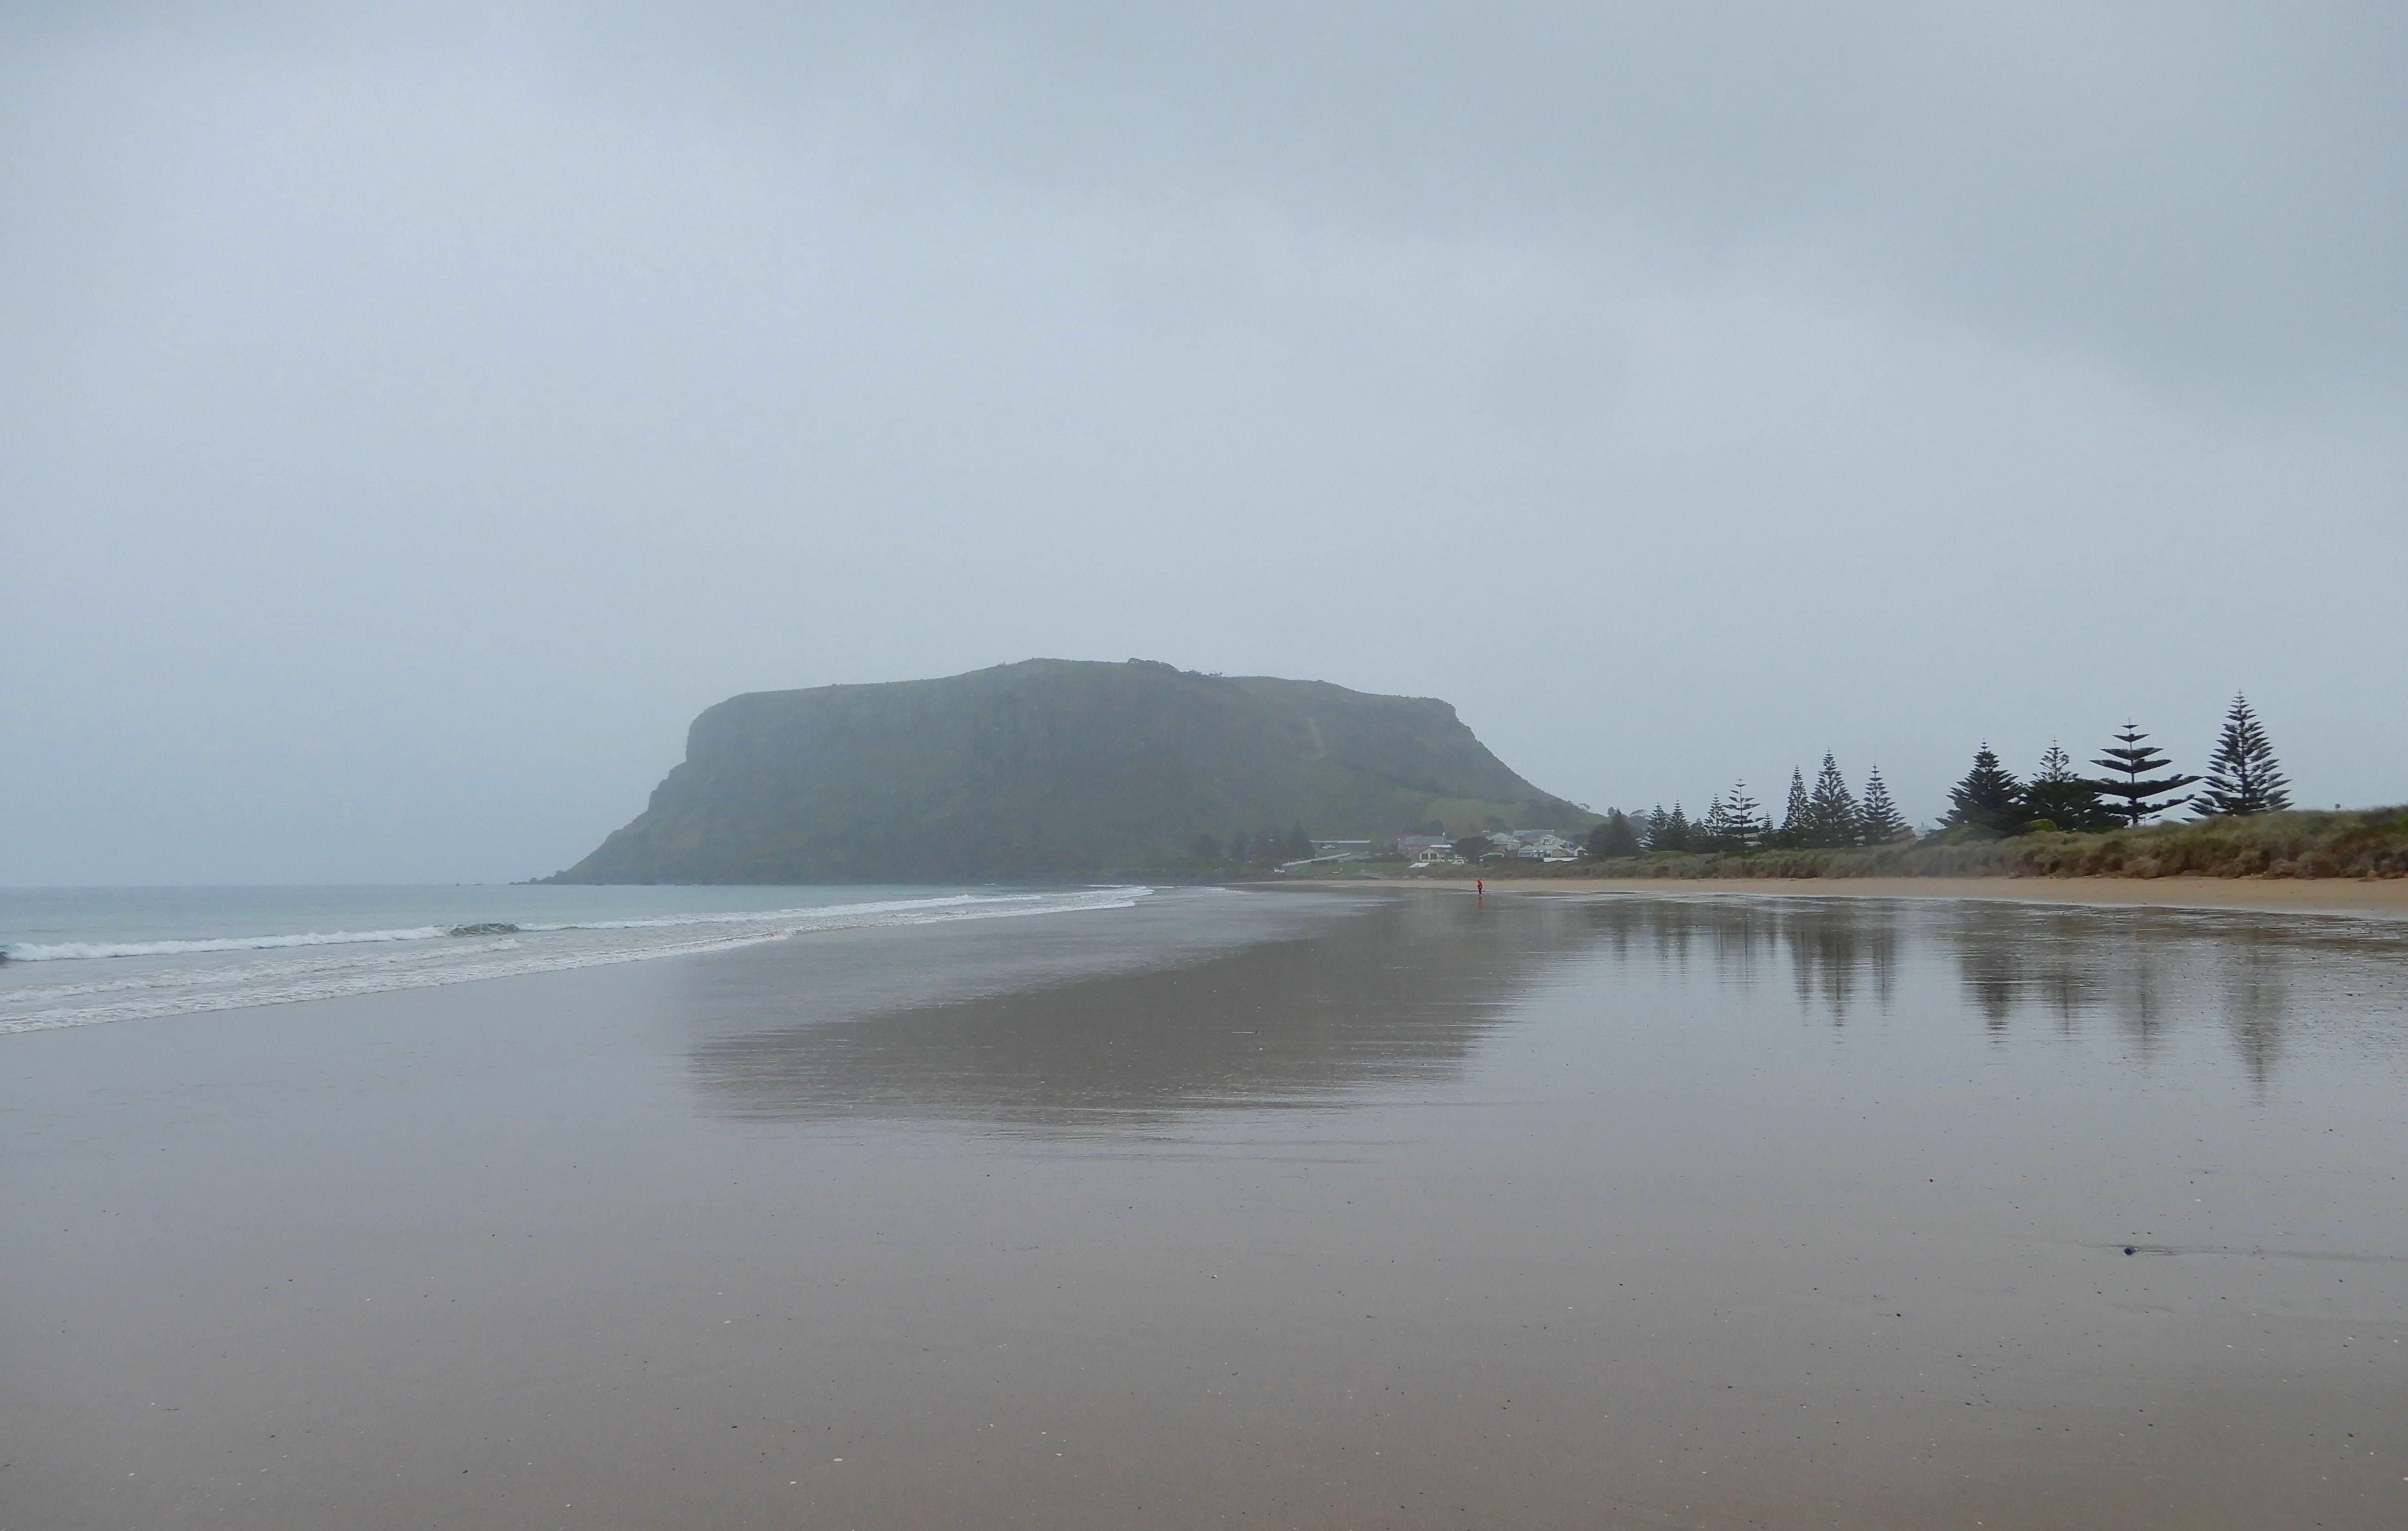 1.Godfreys Beach